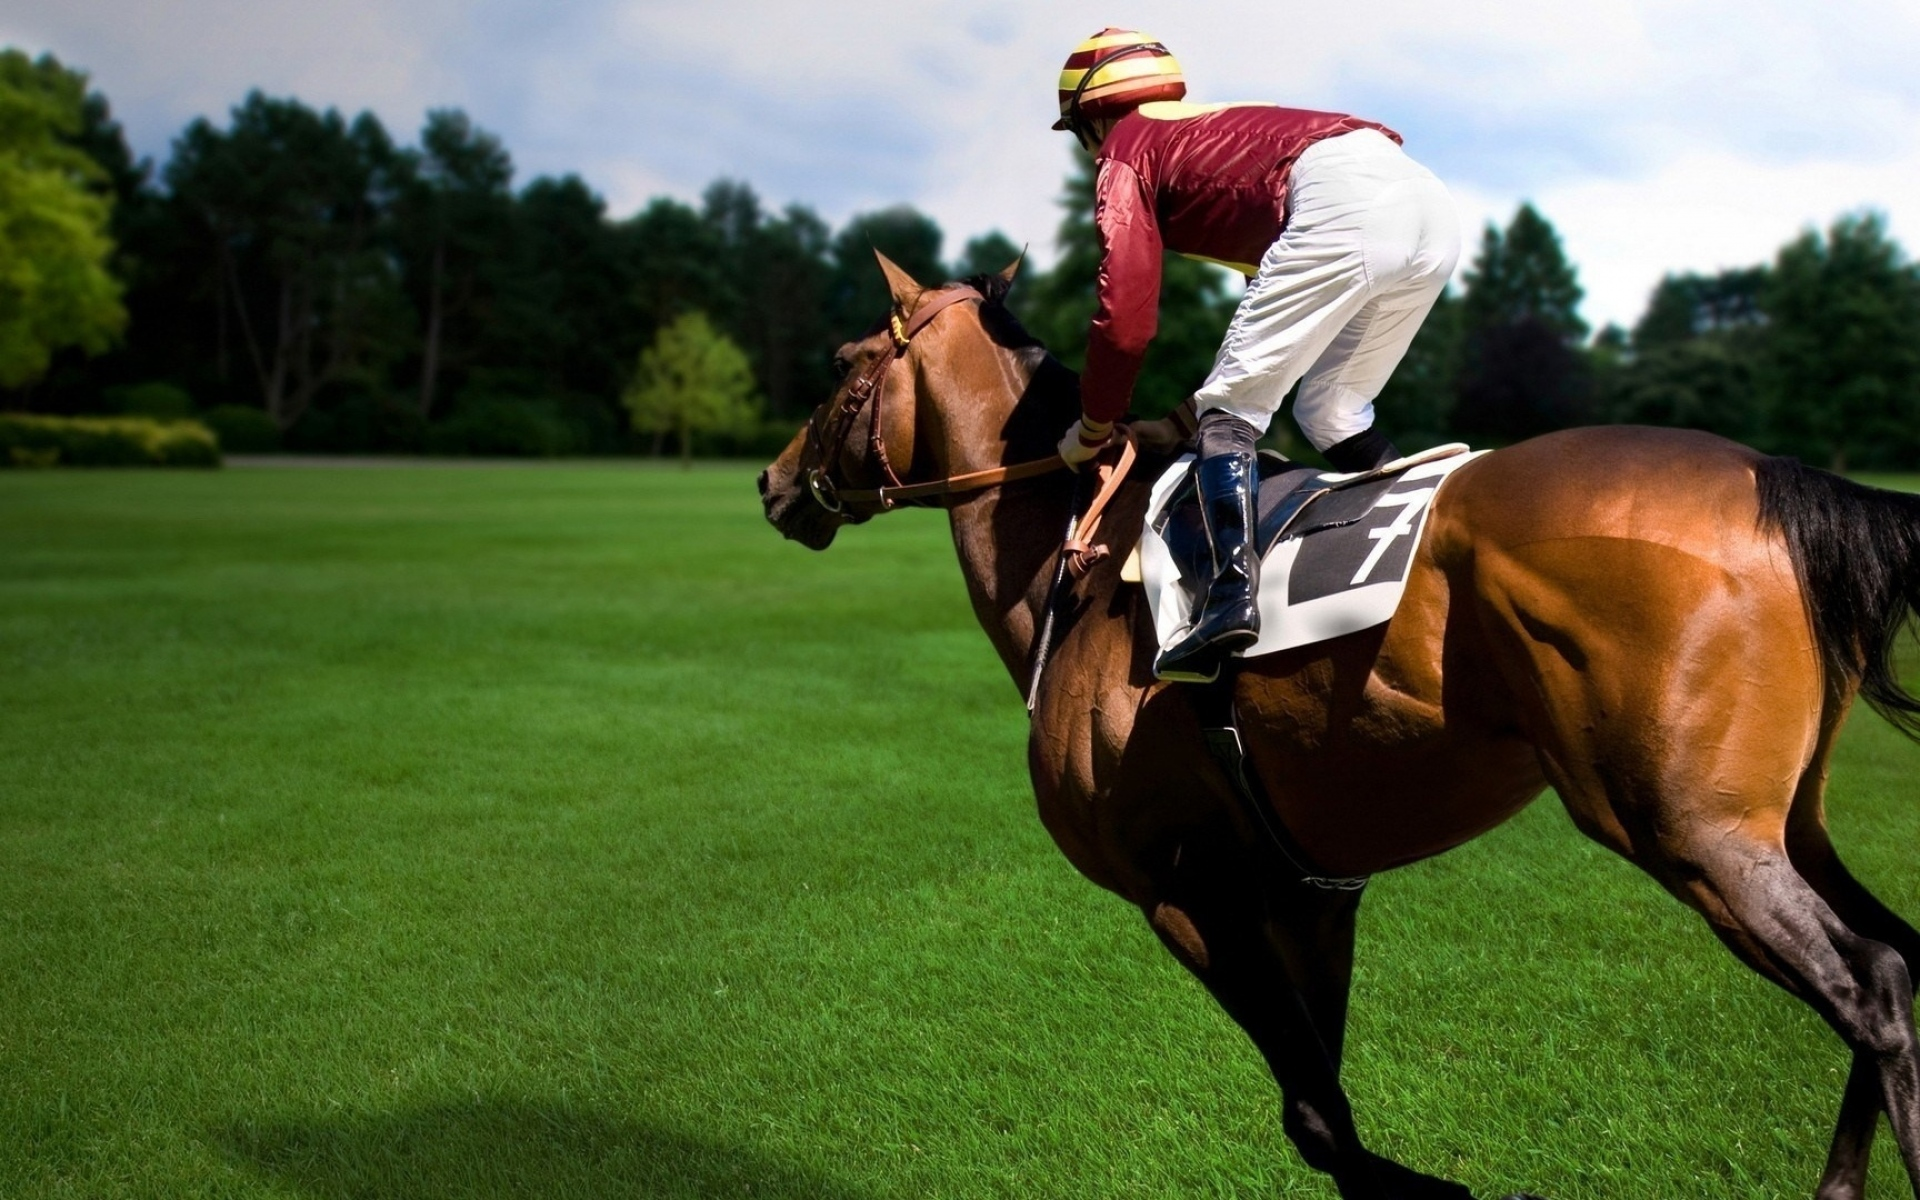 Лошади и всадники картинки